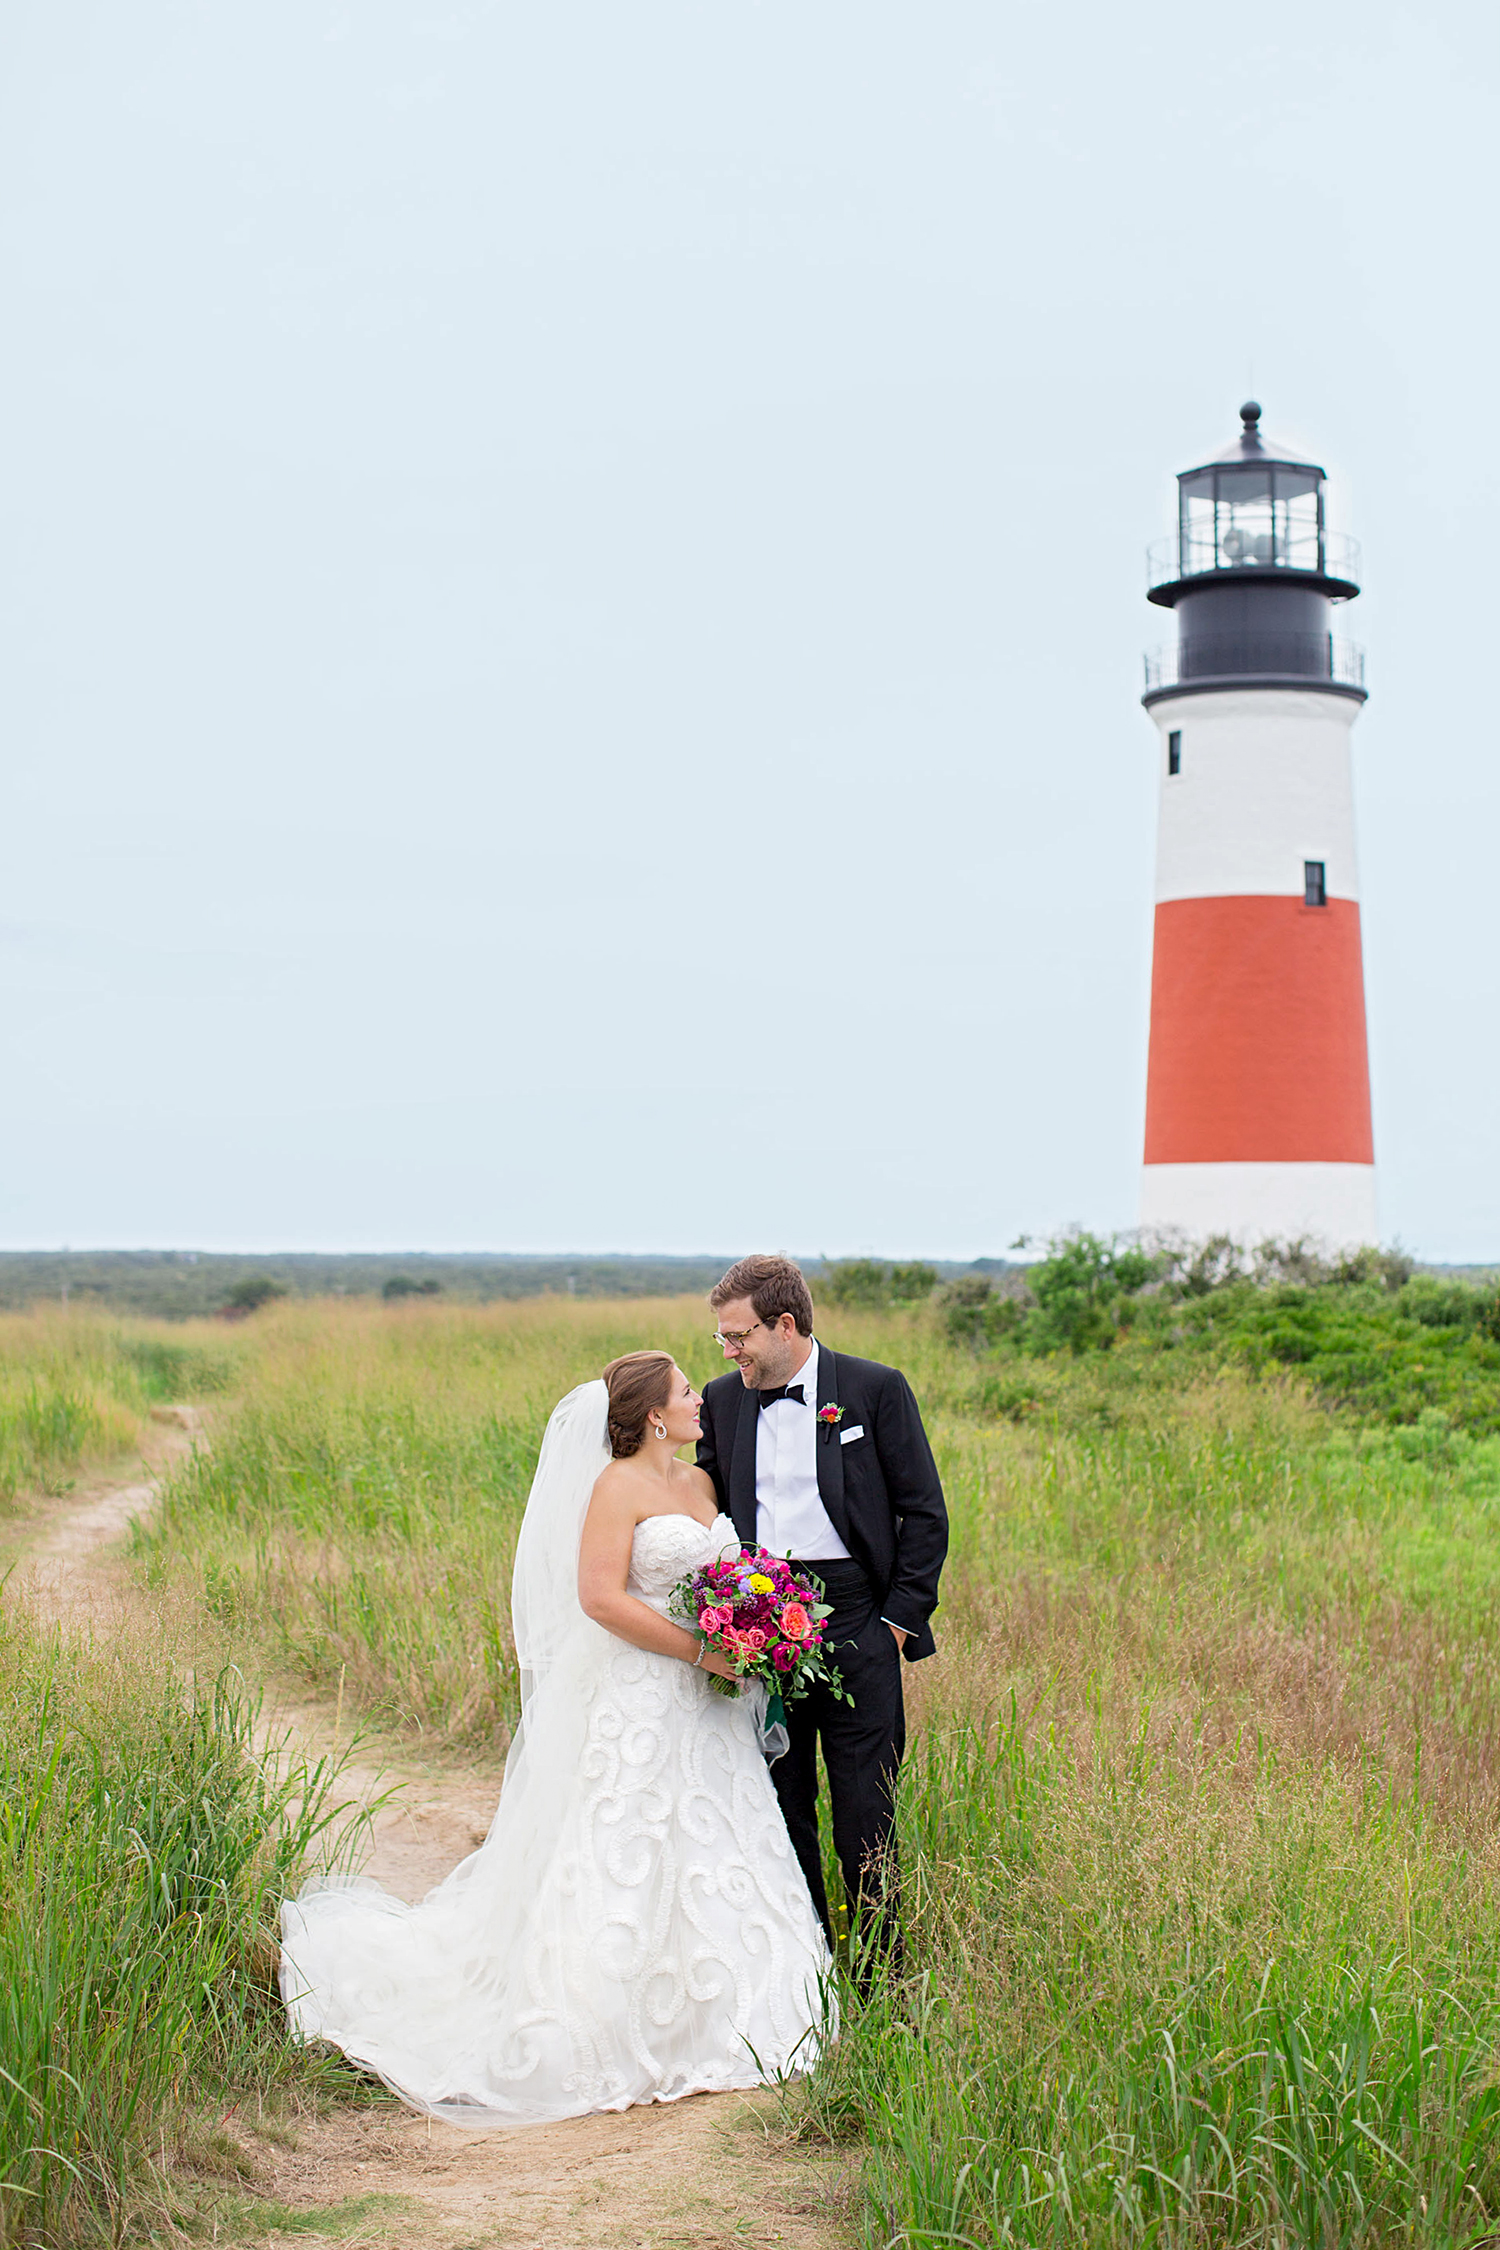 madelyn jon wedding couple and lighthouse